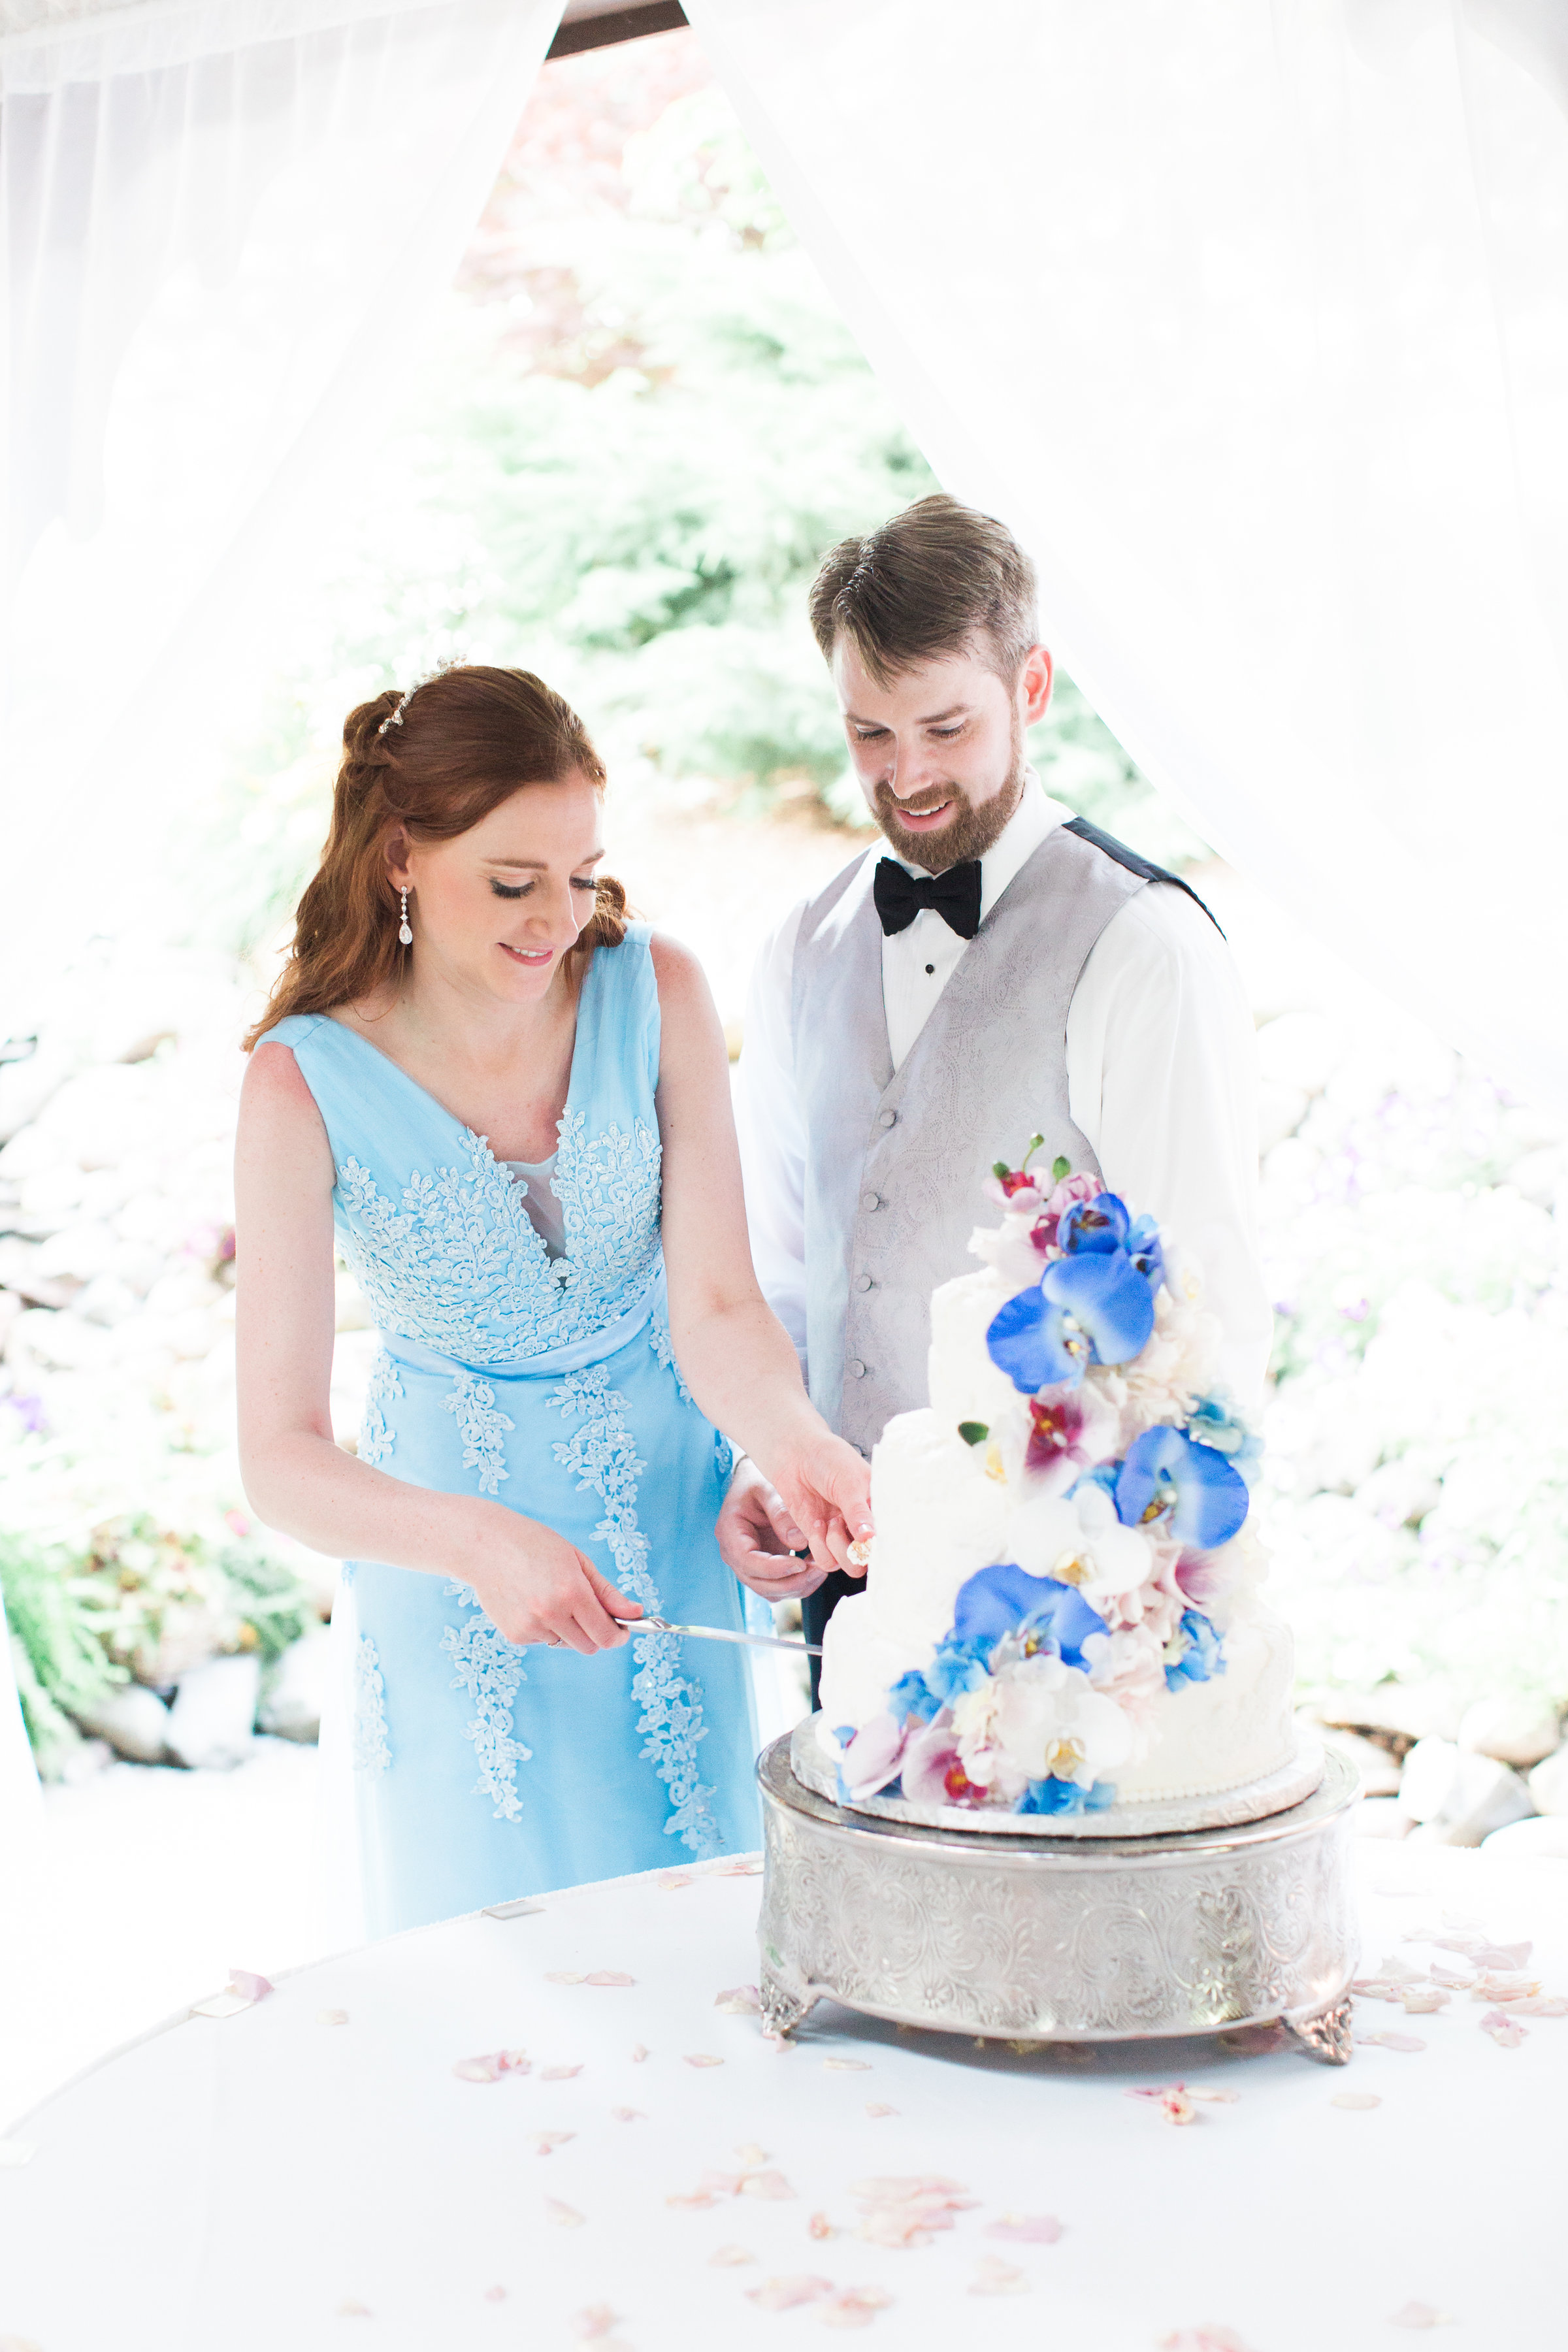 Conger+Wedding+Receptionb-61.jpg